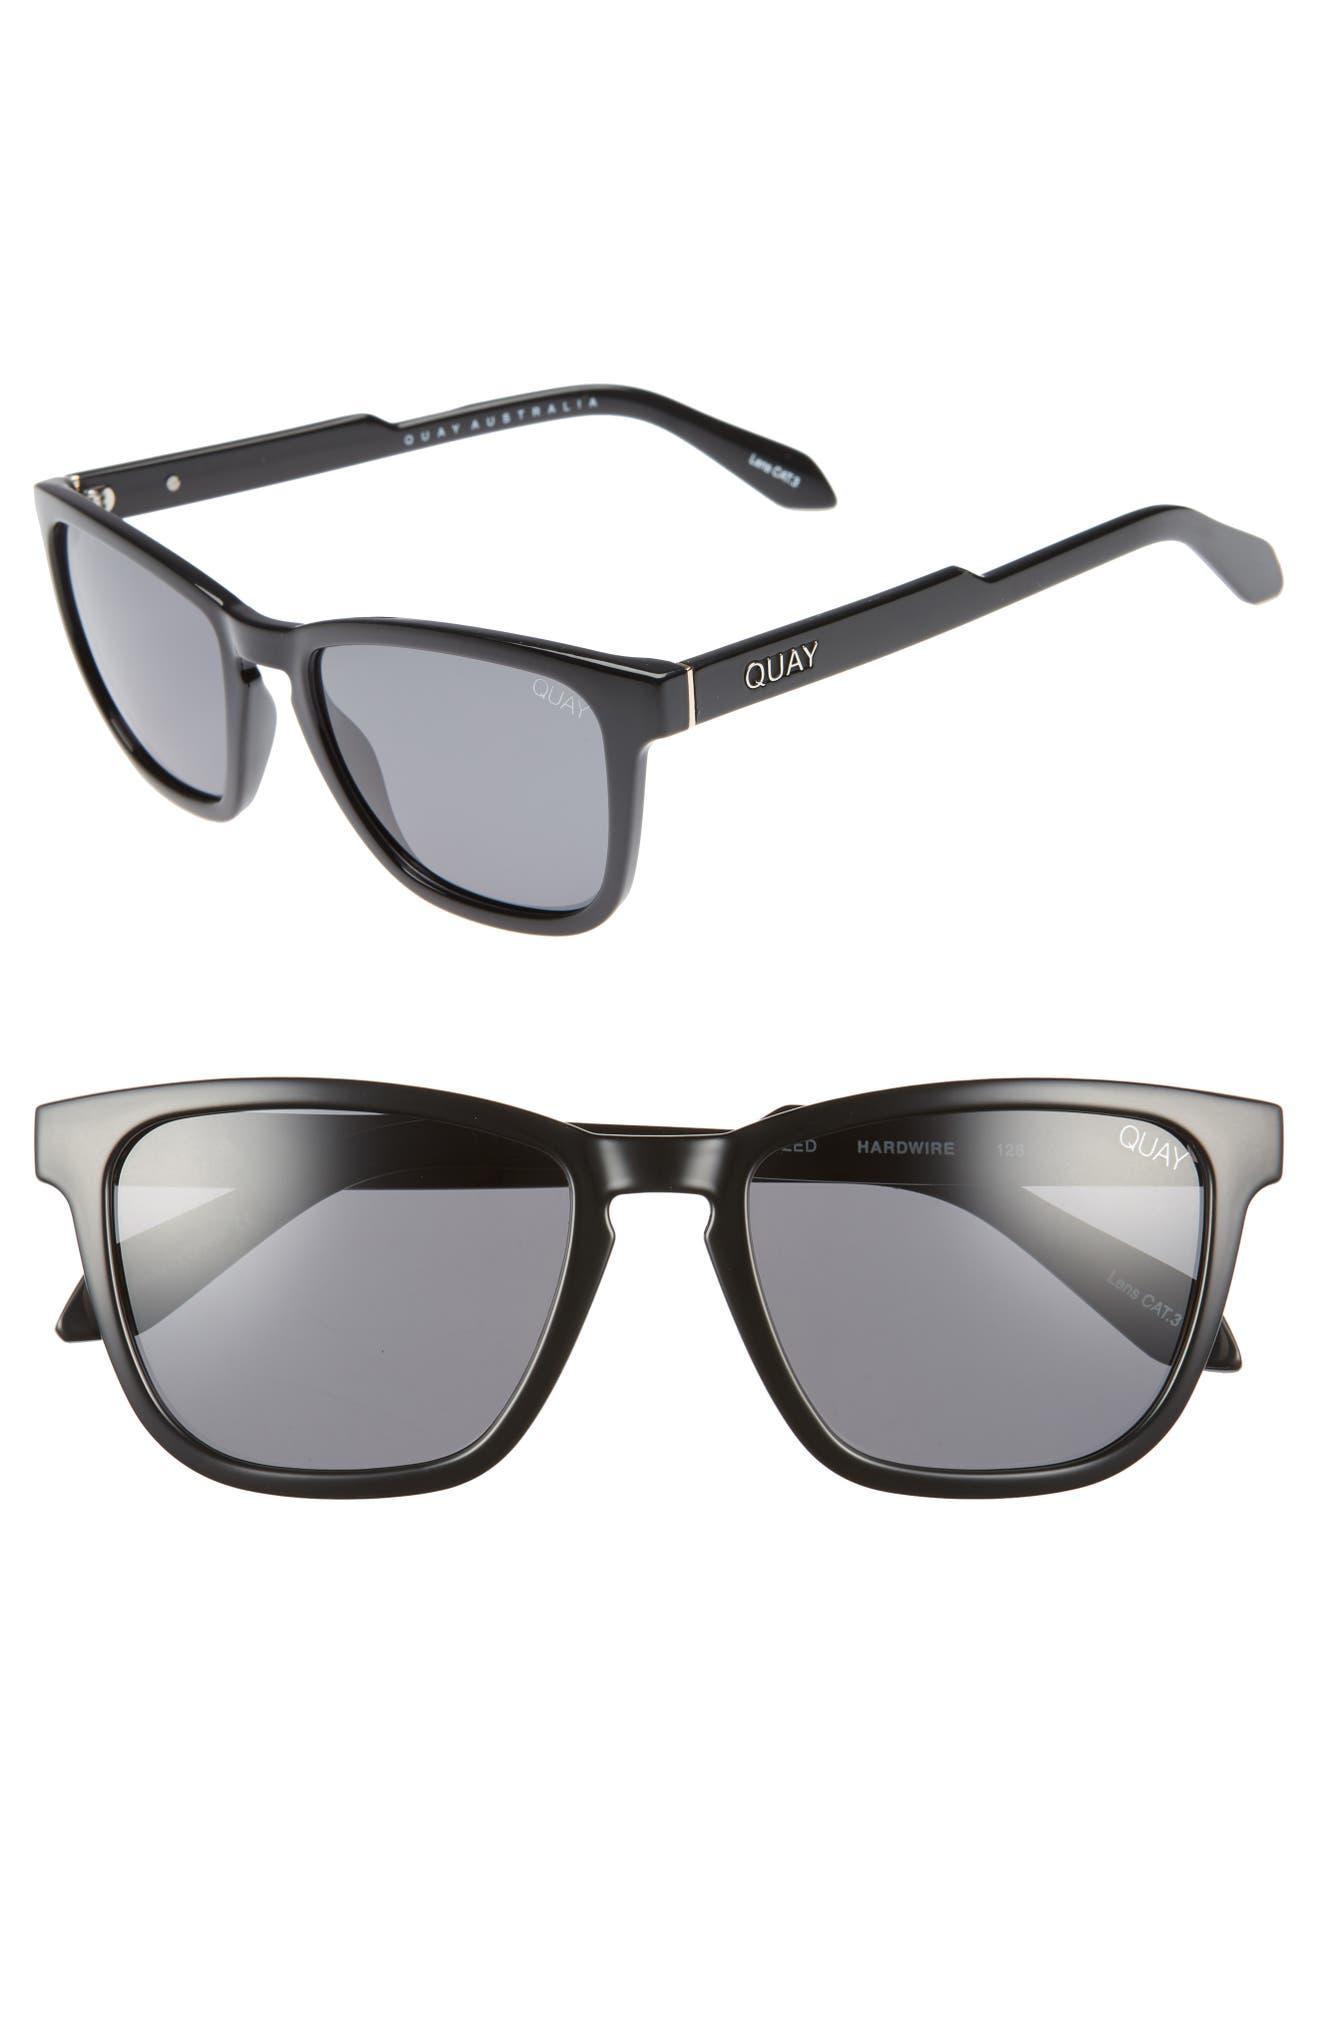 19a18ce711 Quay Australia Hardwire 54mm Polarized Sunglasses